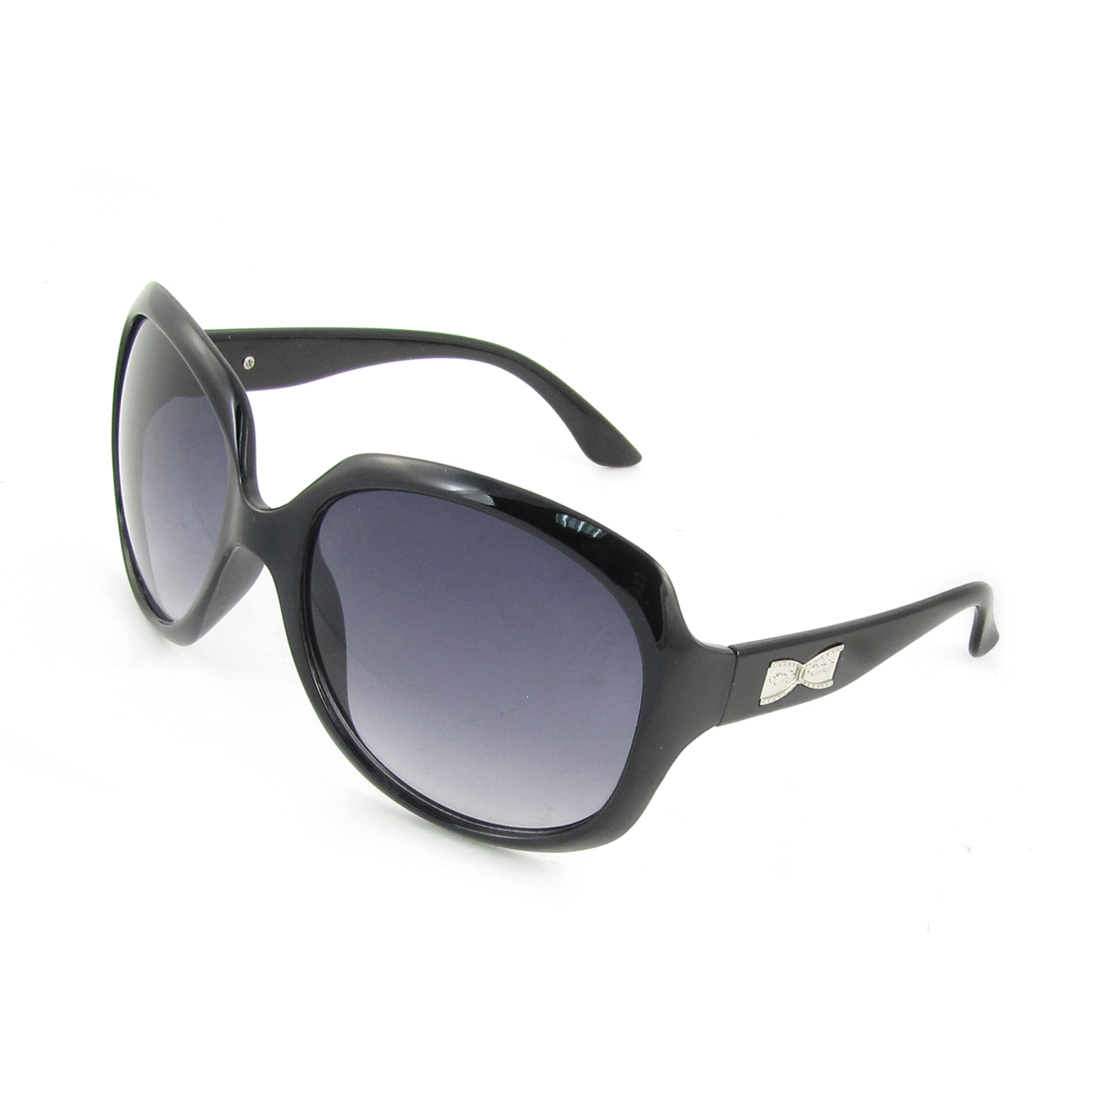 Black Metal Arm Full Rim Frame Single Bridge Sunglasses Glasses for Man